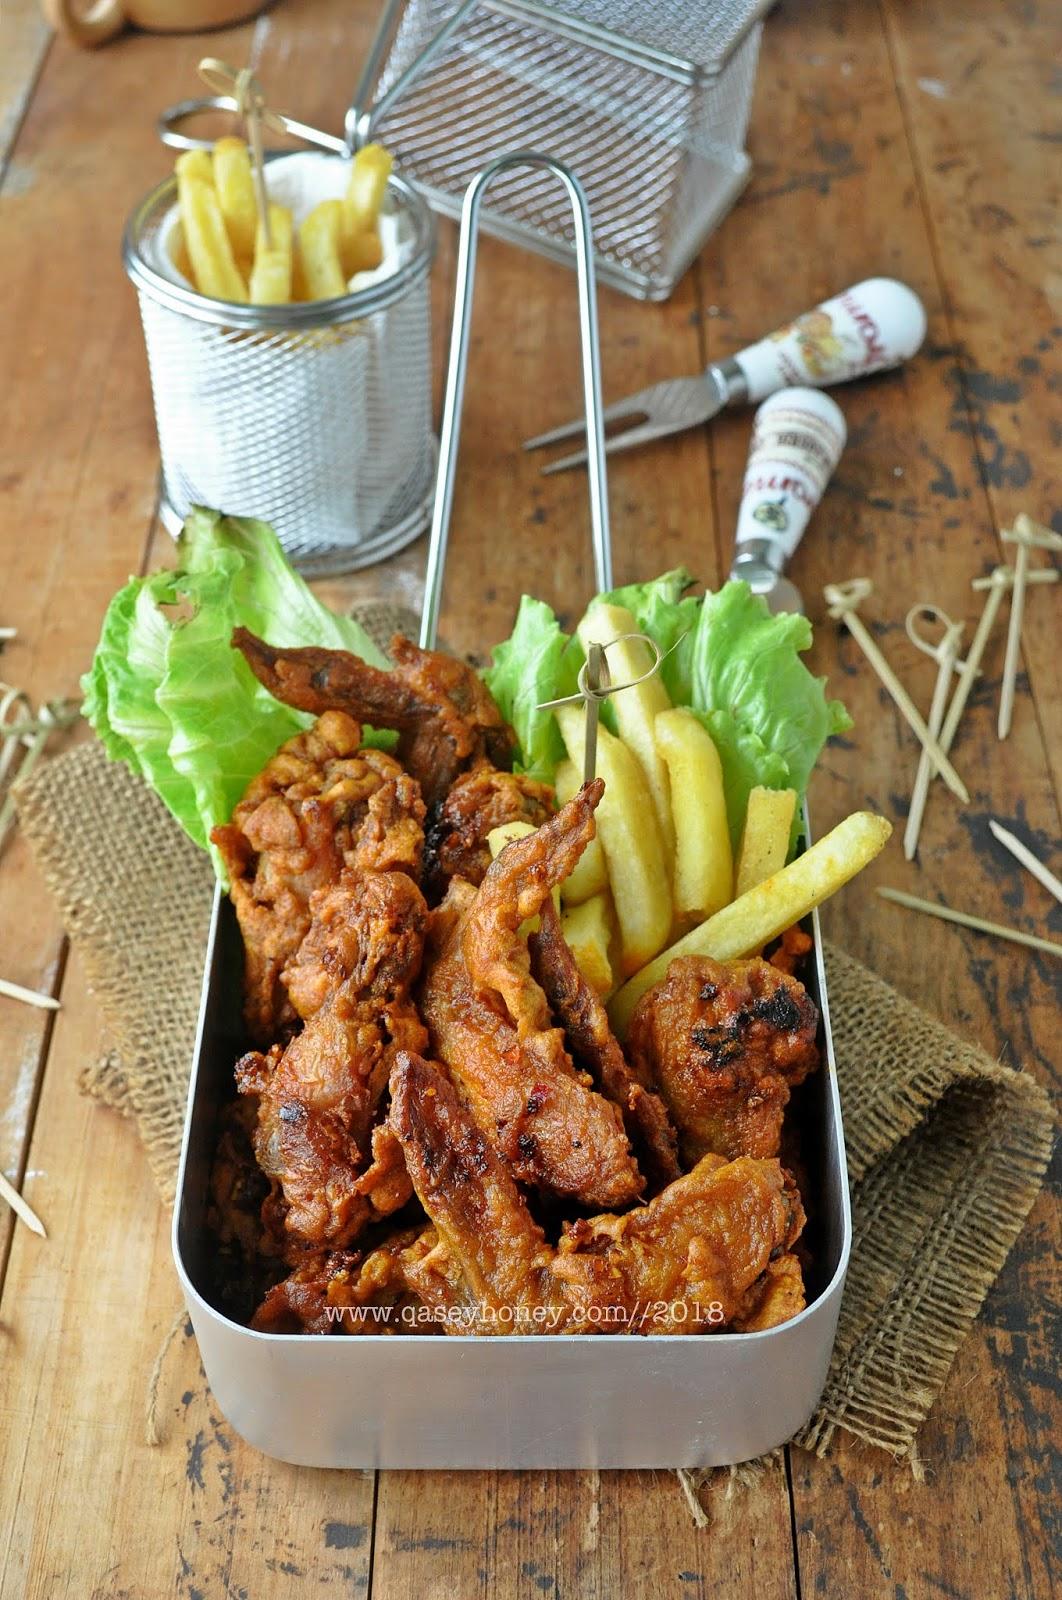 Ayam Goreng Pedas 4finger Inspired Crunchy Korean Fried Chicken Qasey Honey